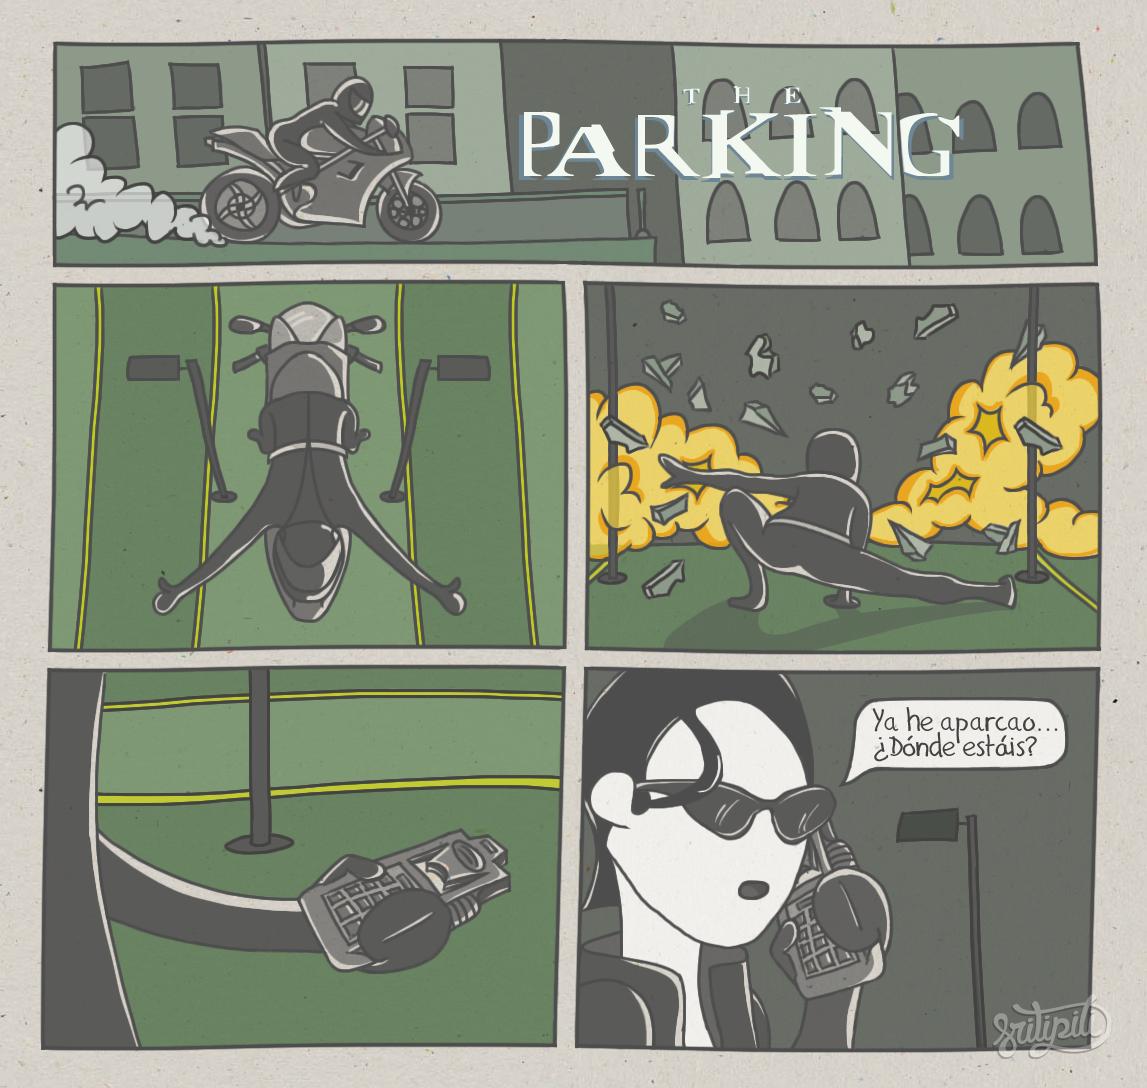 Trinity aparcando